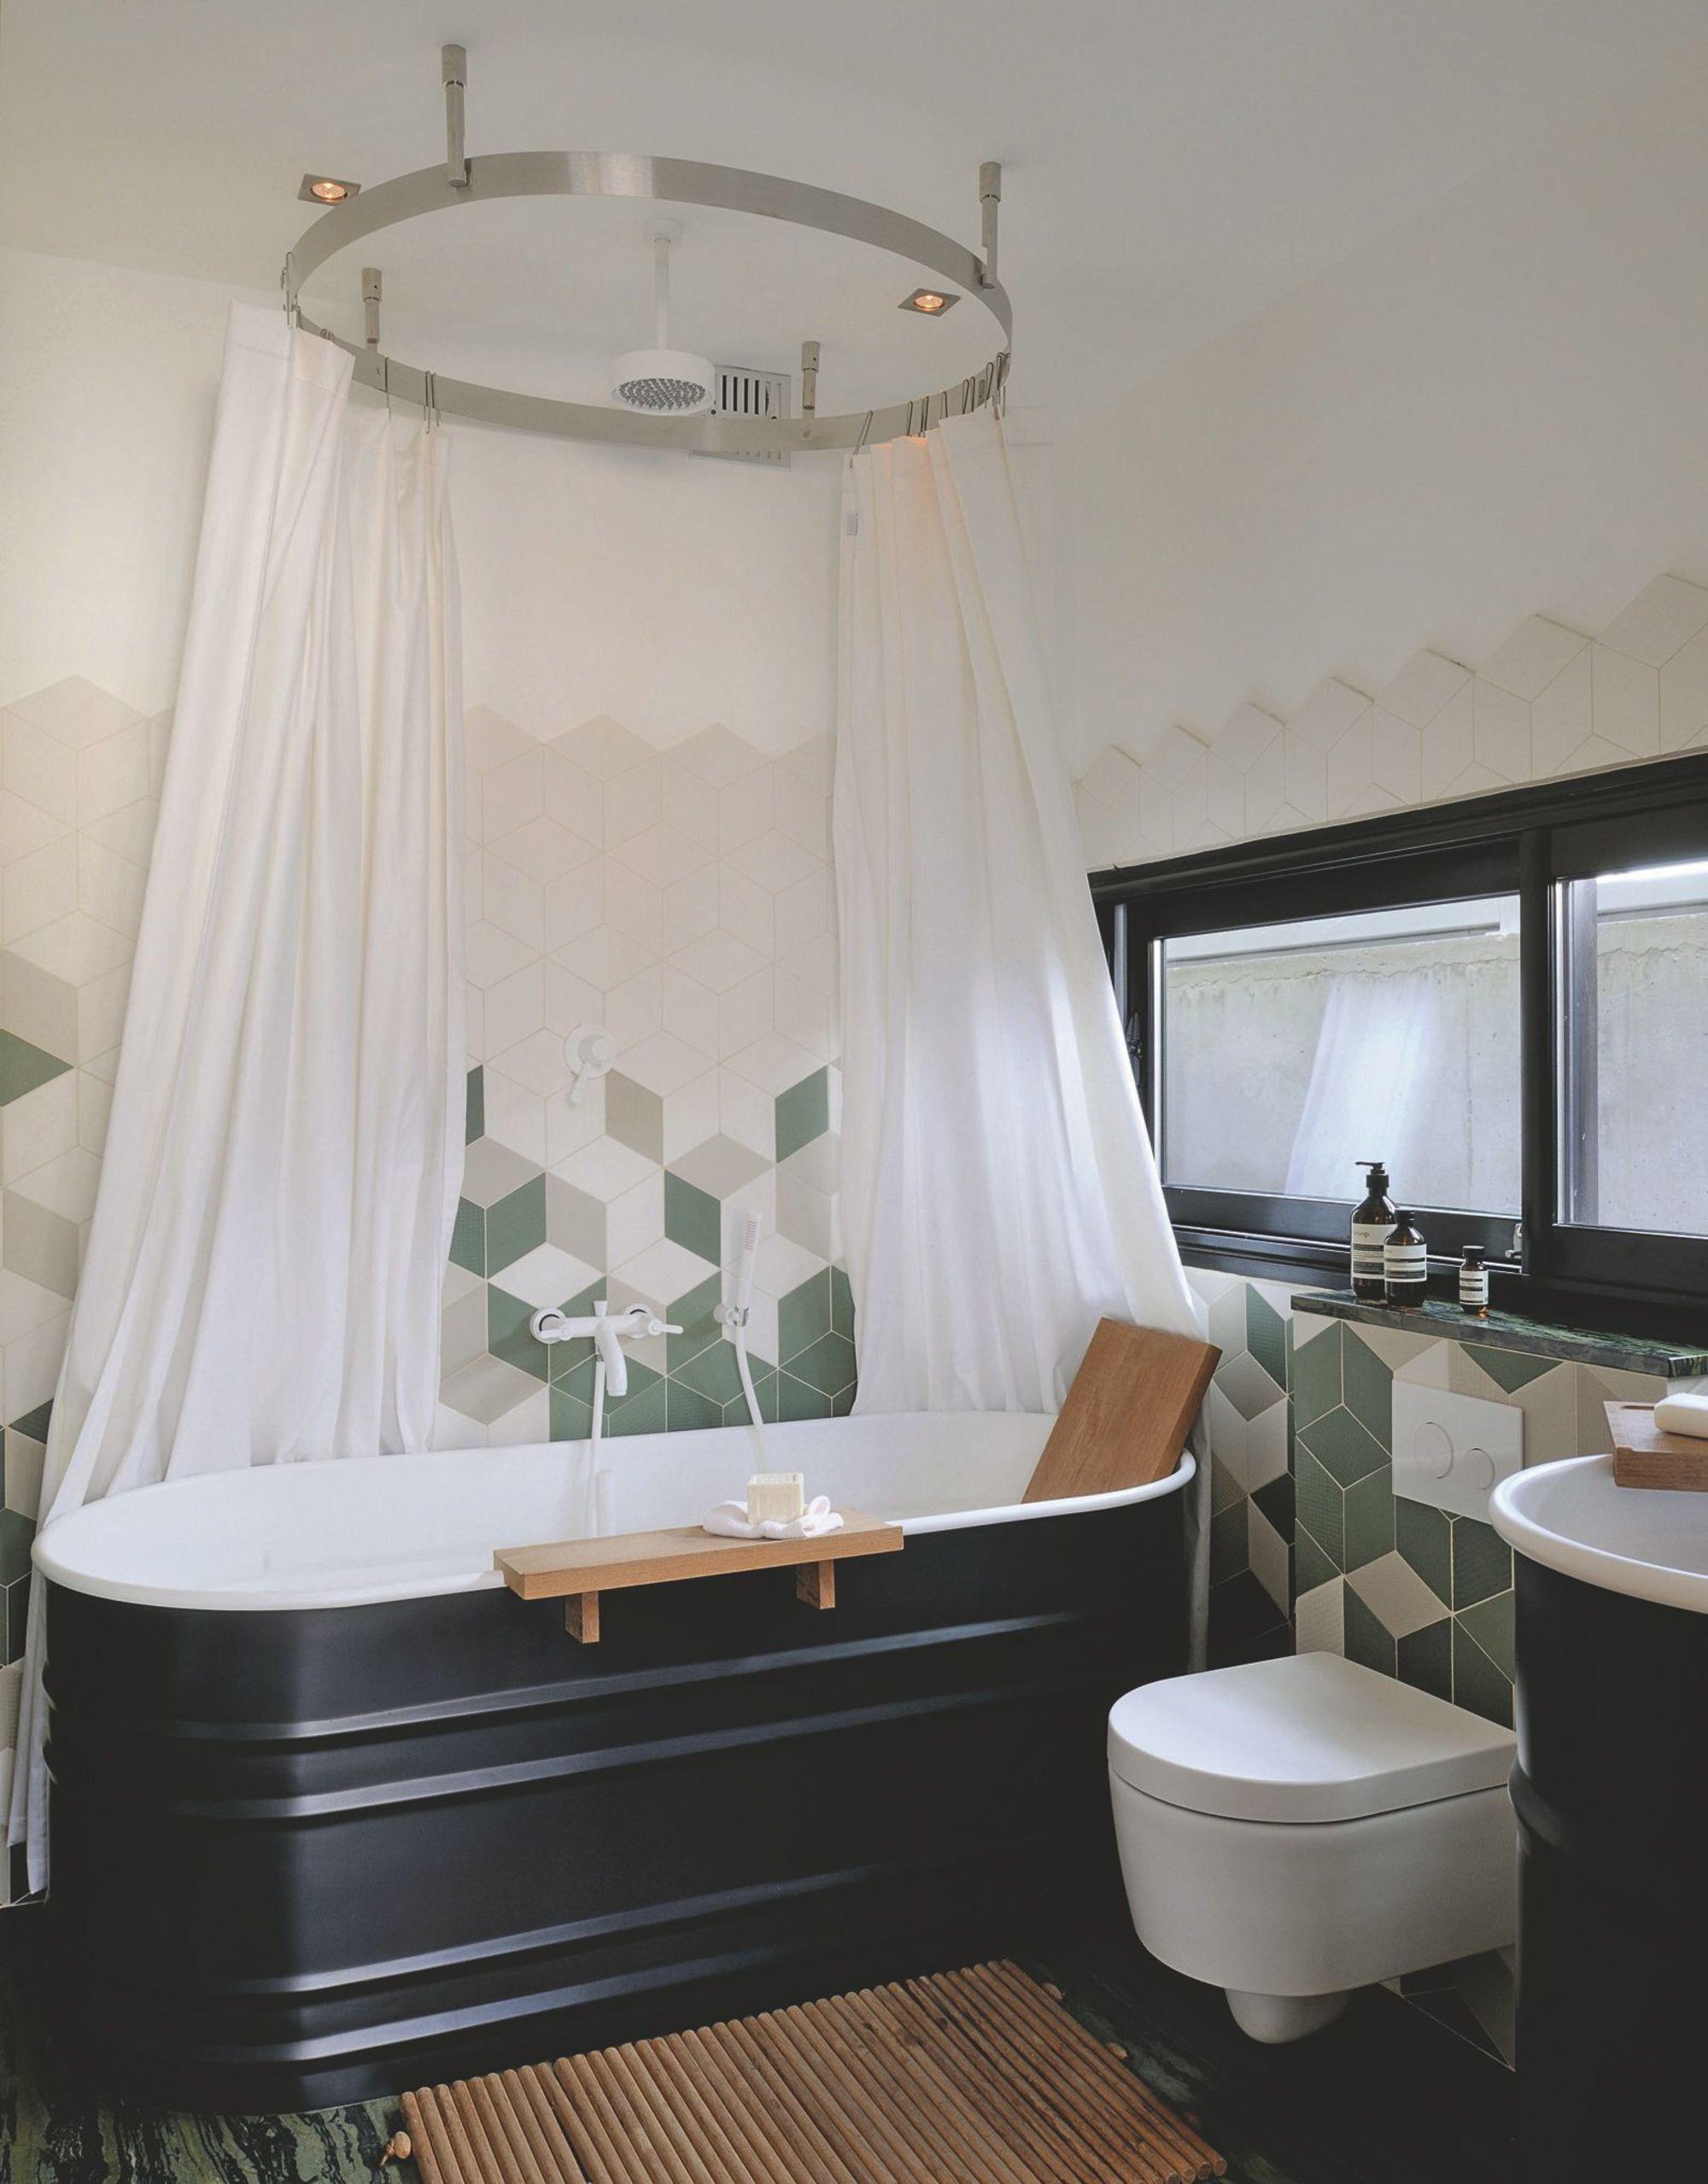 Modernt med gr nt i badrum badrumsdr mmar for Agape salle de bain